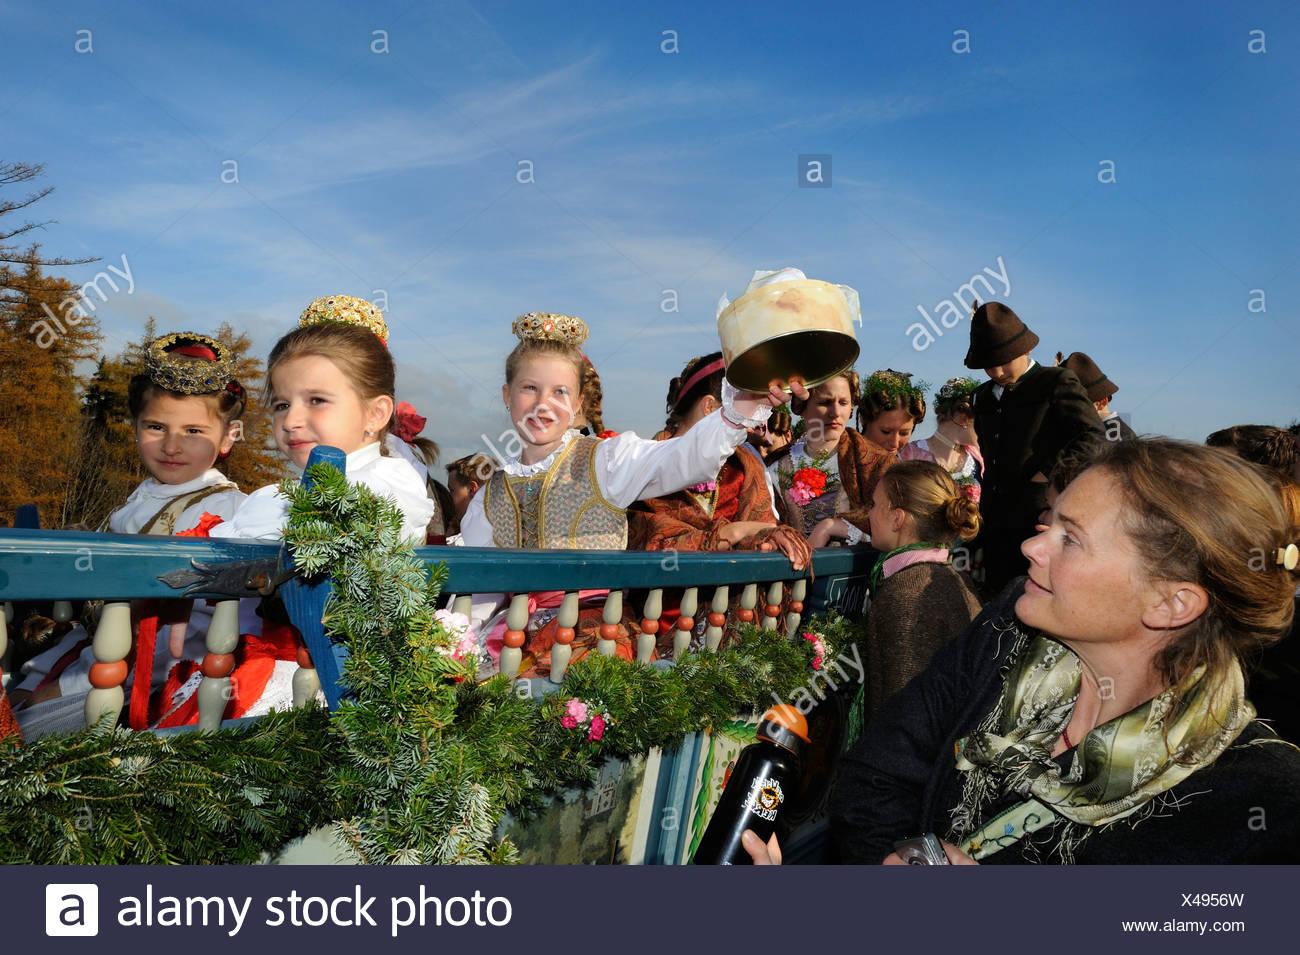 Leonhardifahrt, a procession with horses for the feast day of Saint Leonard of Noblac, Bad Toelz, Upper Bavaria, Bavaria - Stock Image